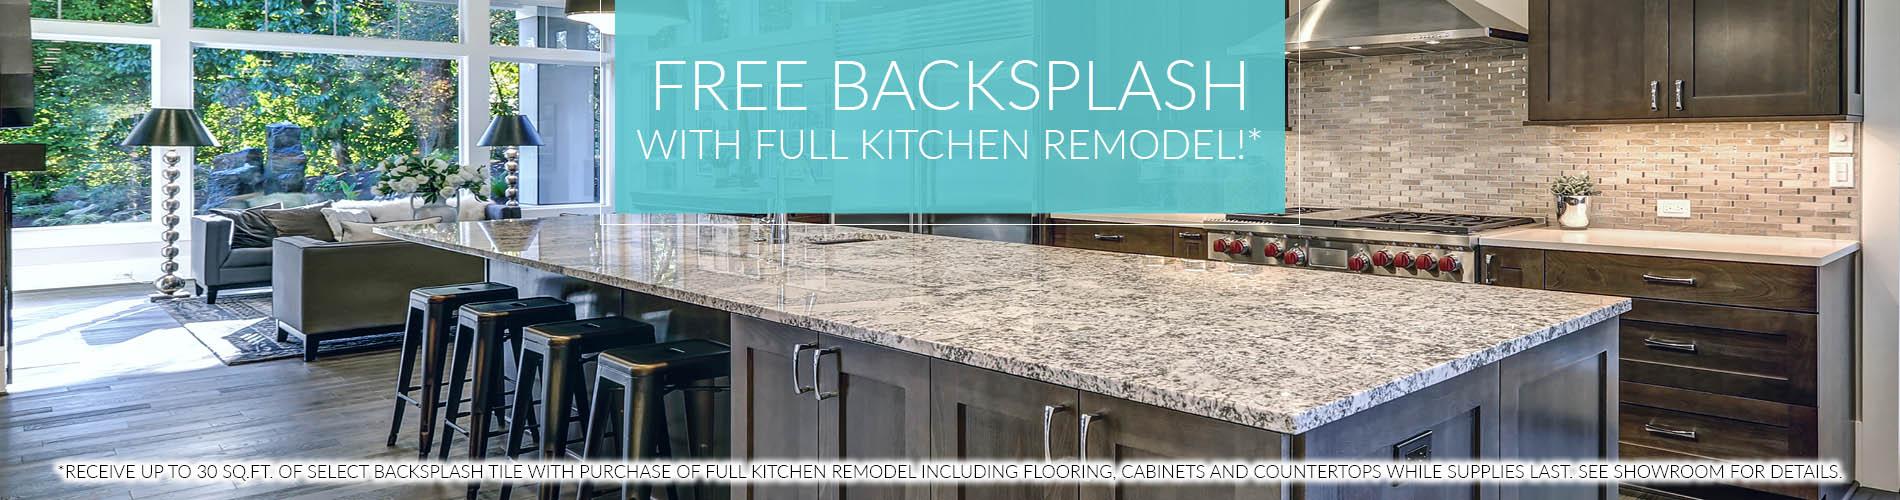 Free Tile Backsplash with Full Kitchen Remodel!* - Bourbonnais, Il ...